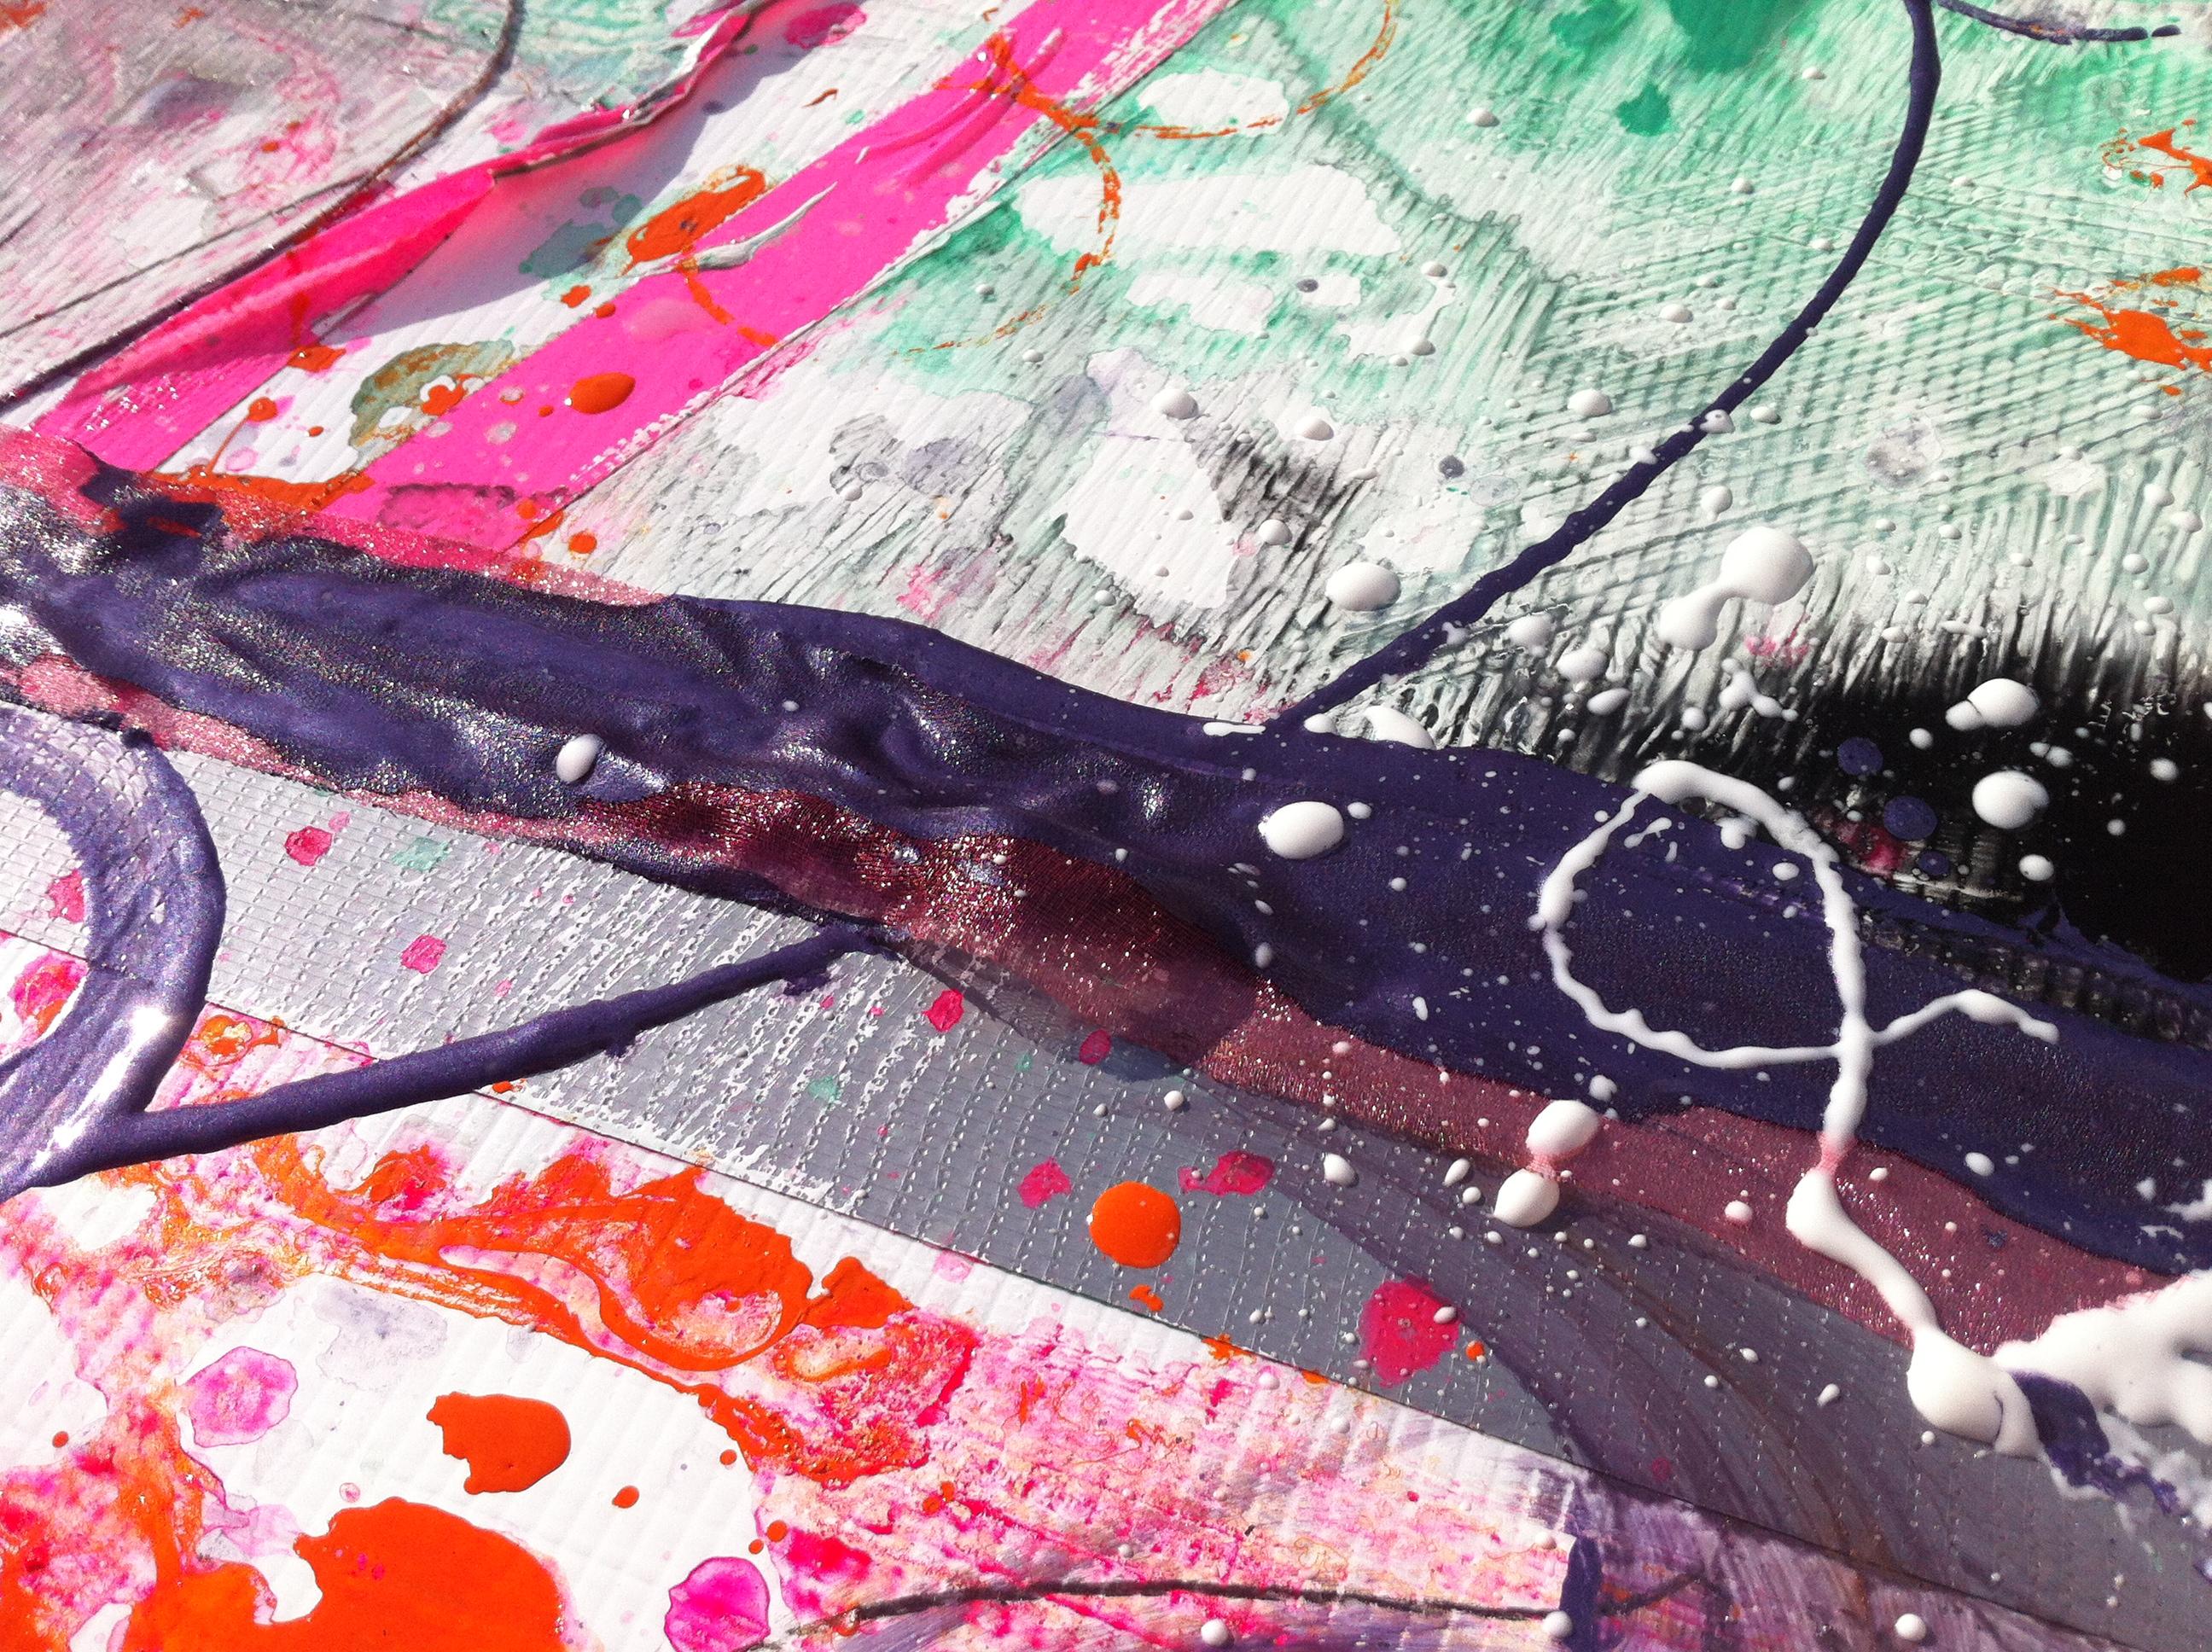 samantha clark art poetry fluoro pink 5